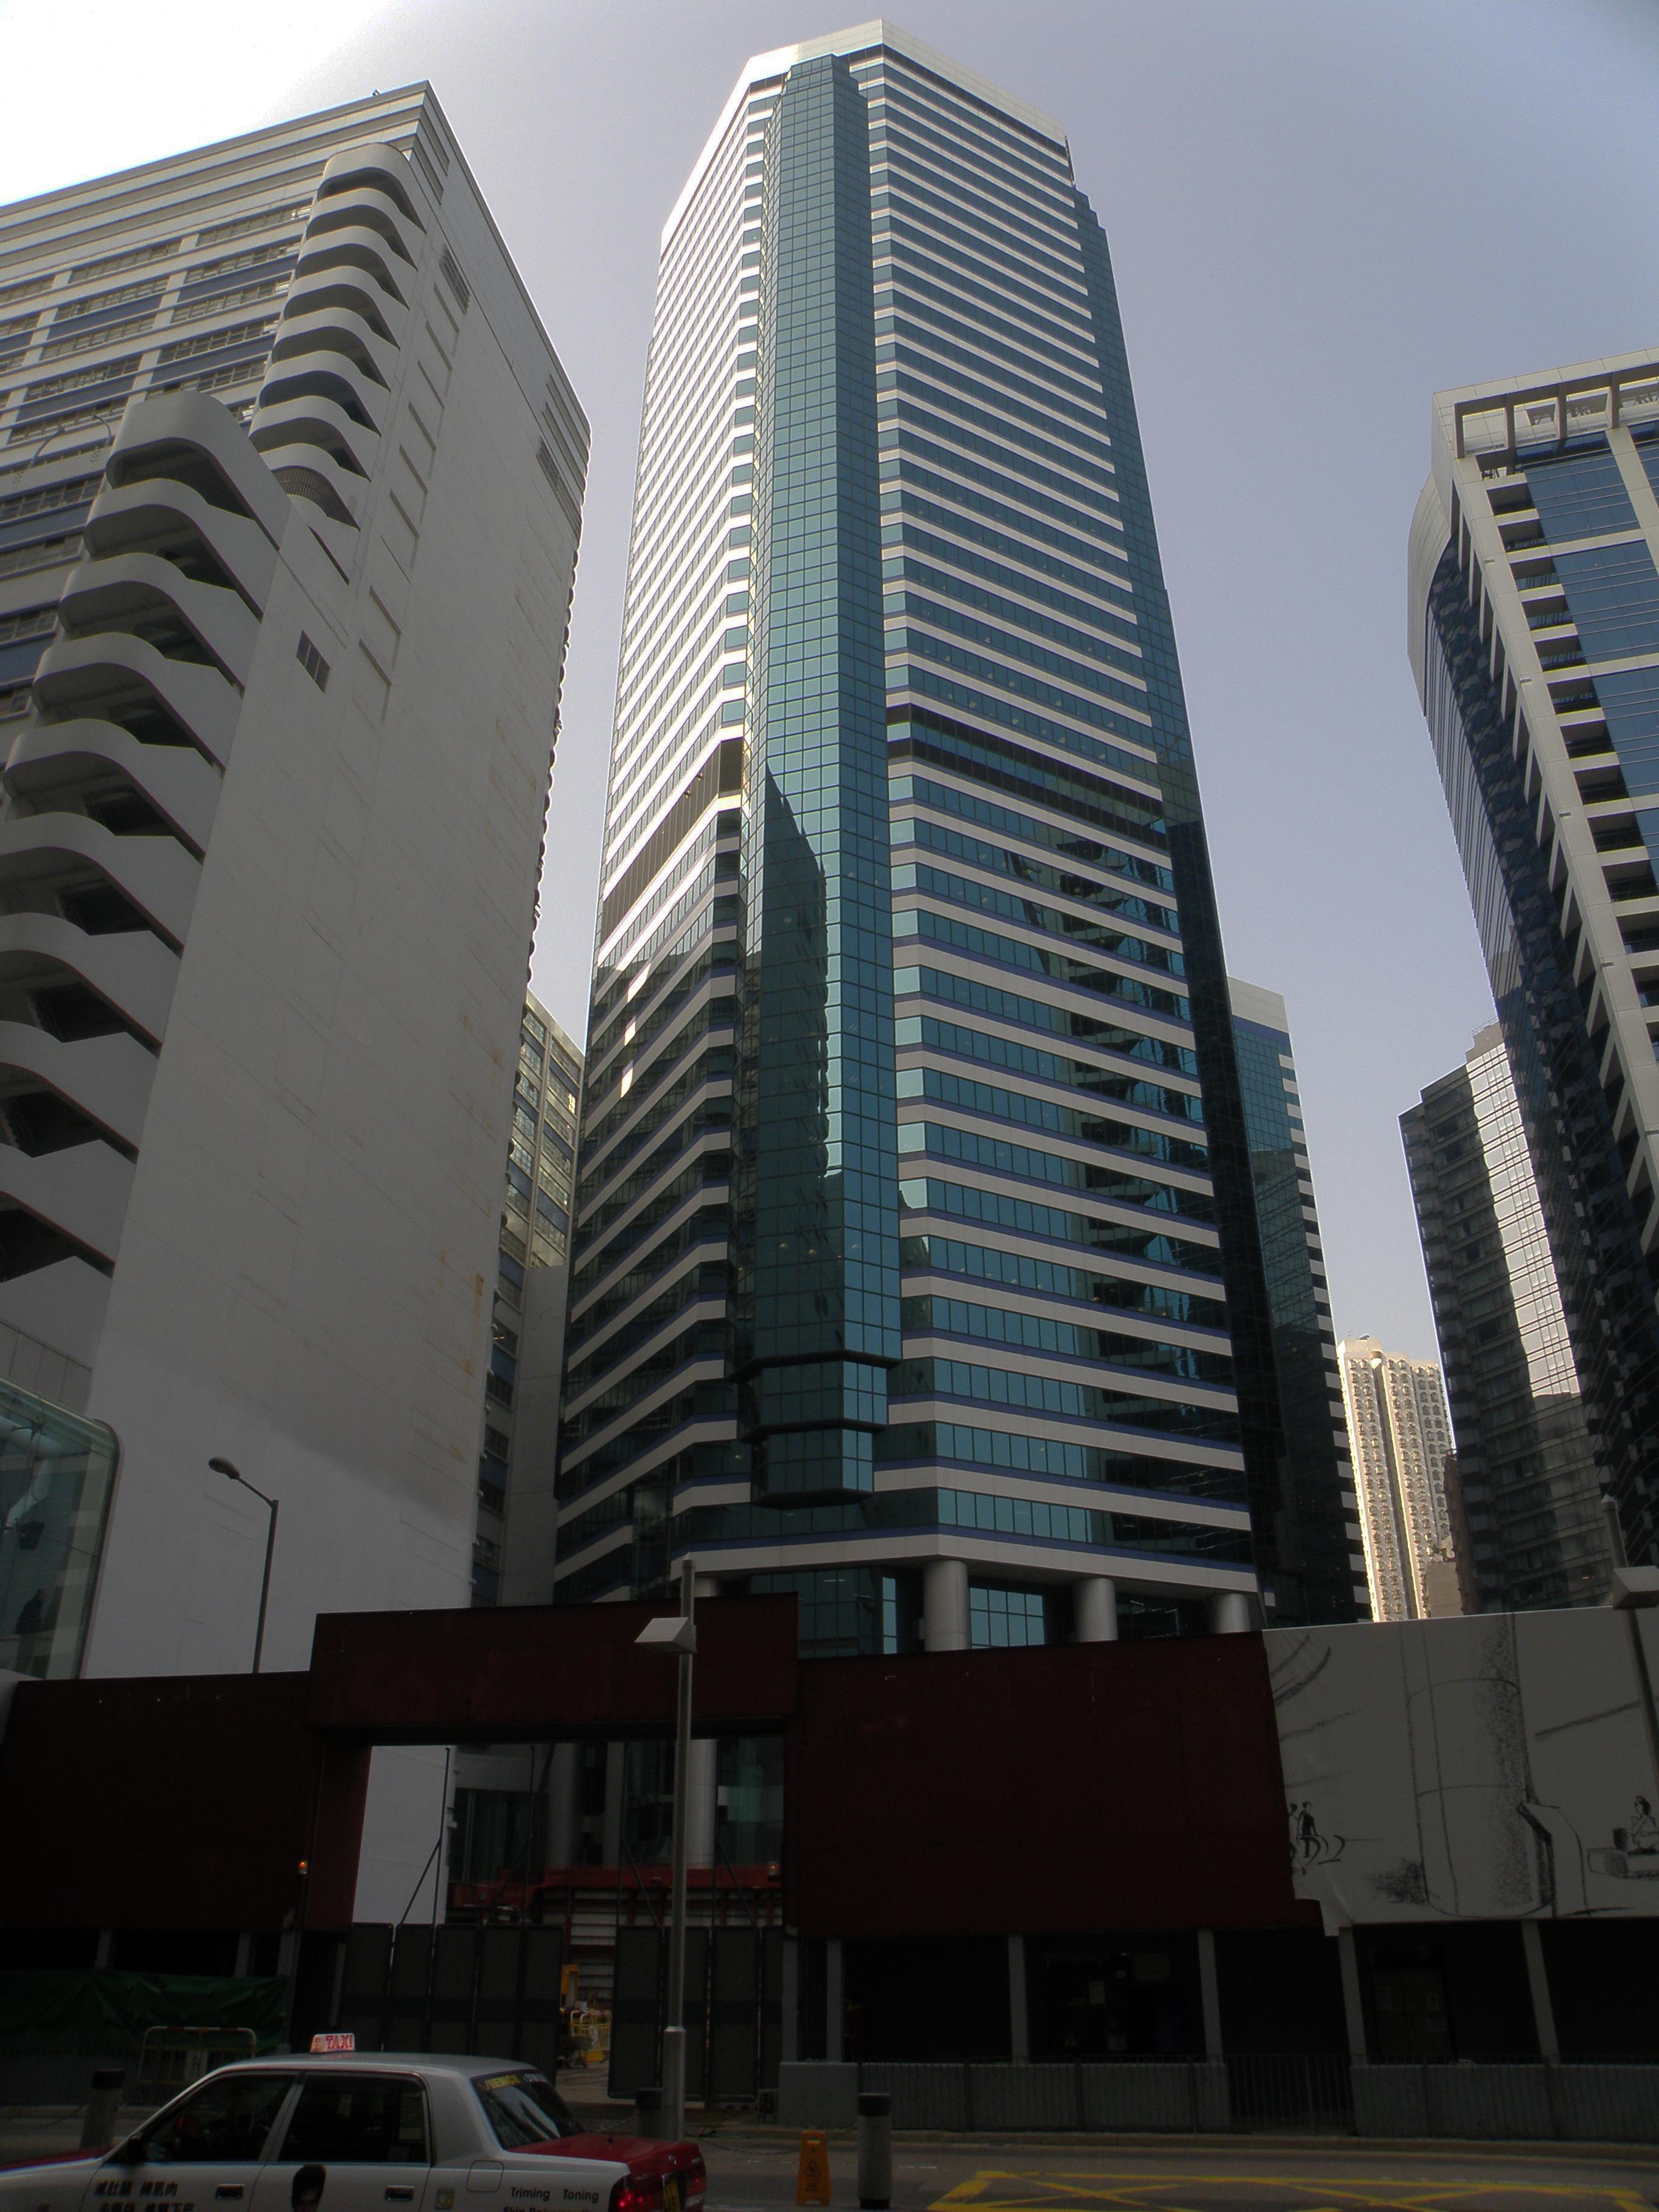 Taikoo Place - Wikipedia